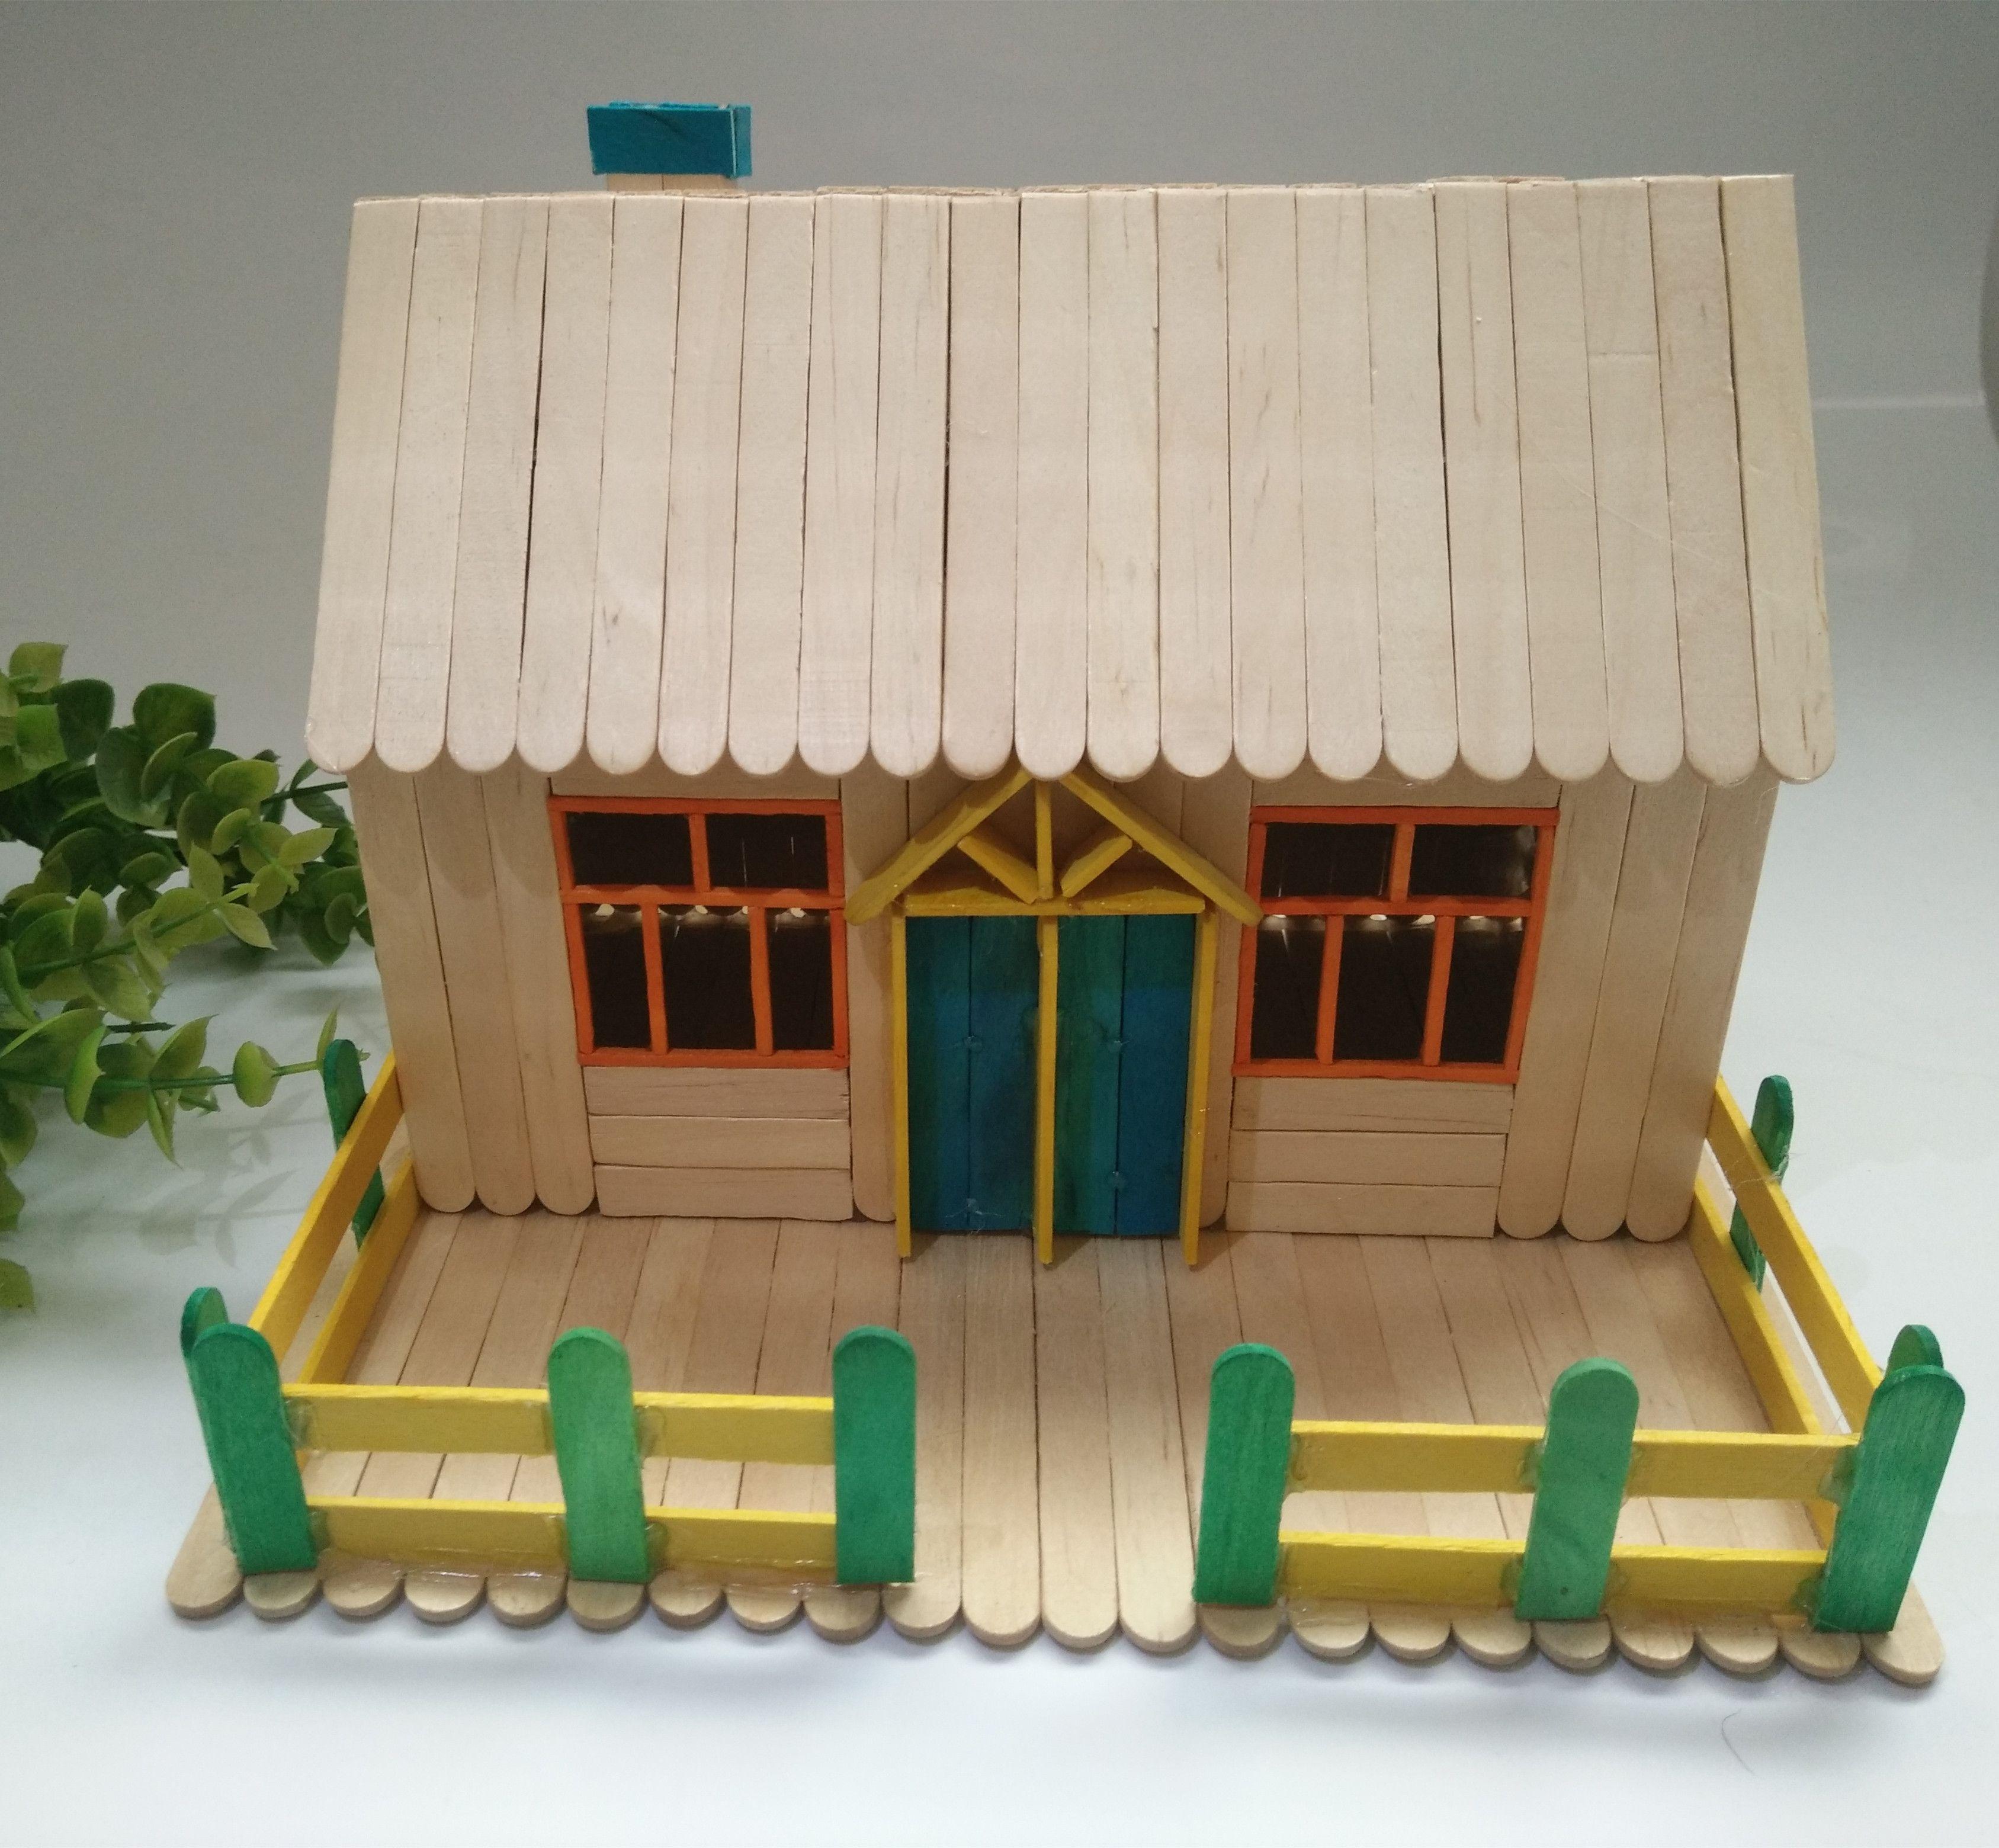 Ice Cream Stick Handmade Model Wood Products Making Diy Ice